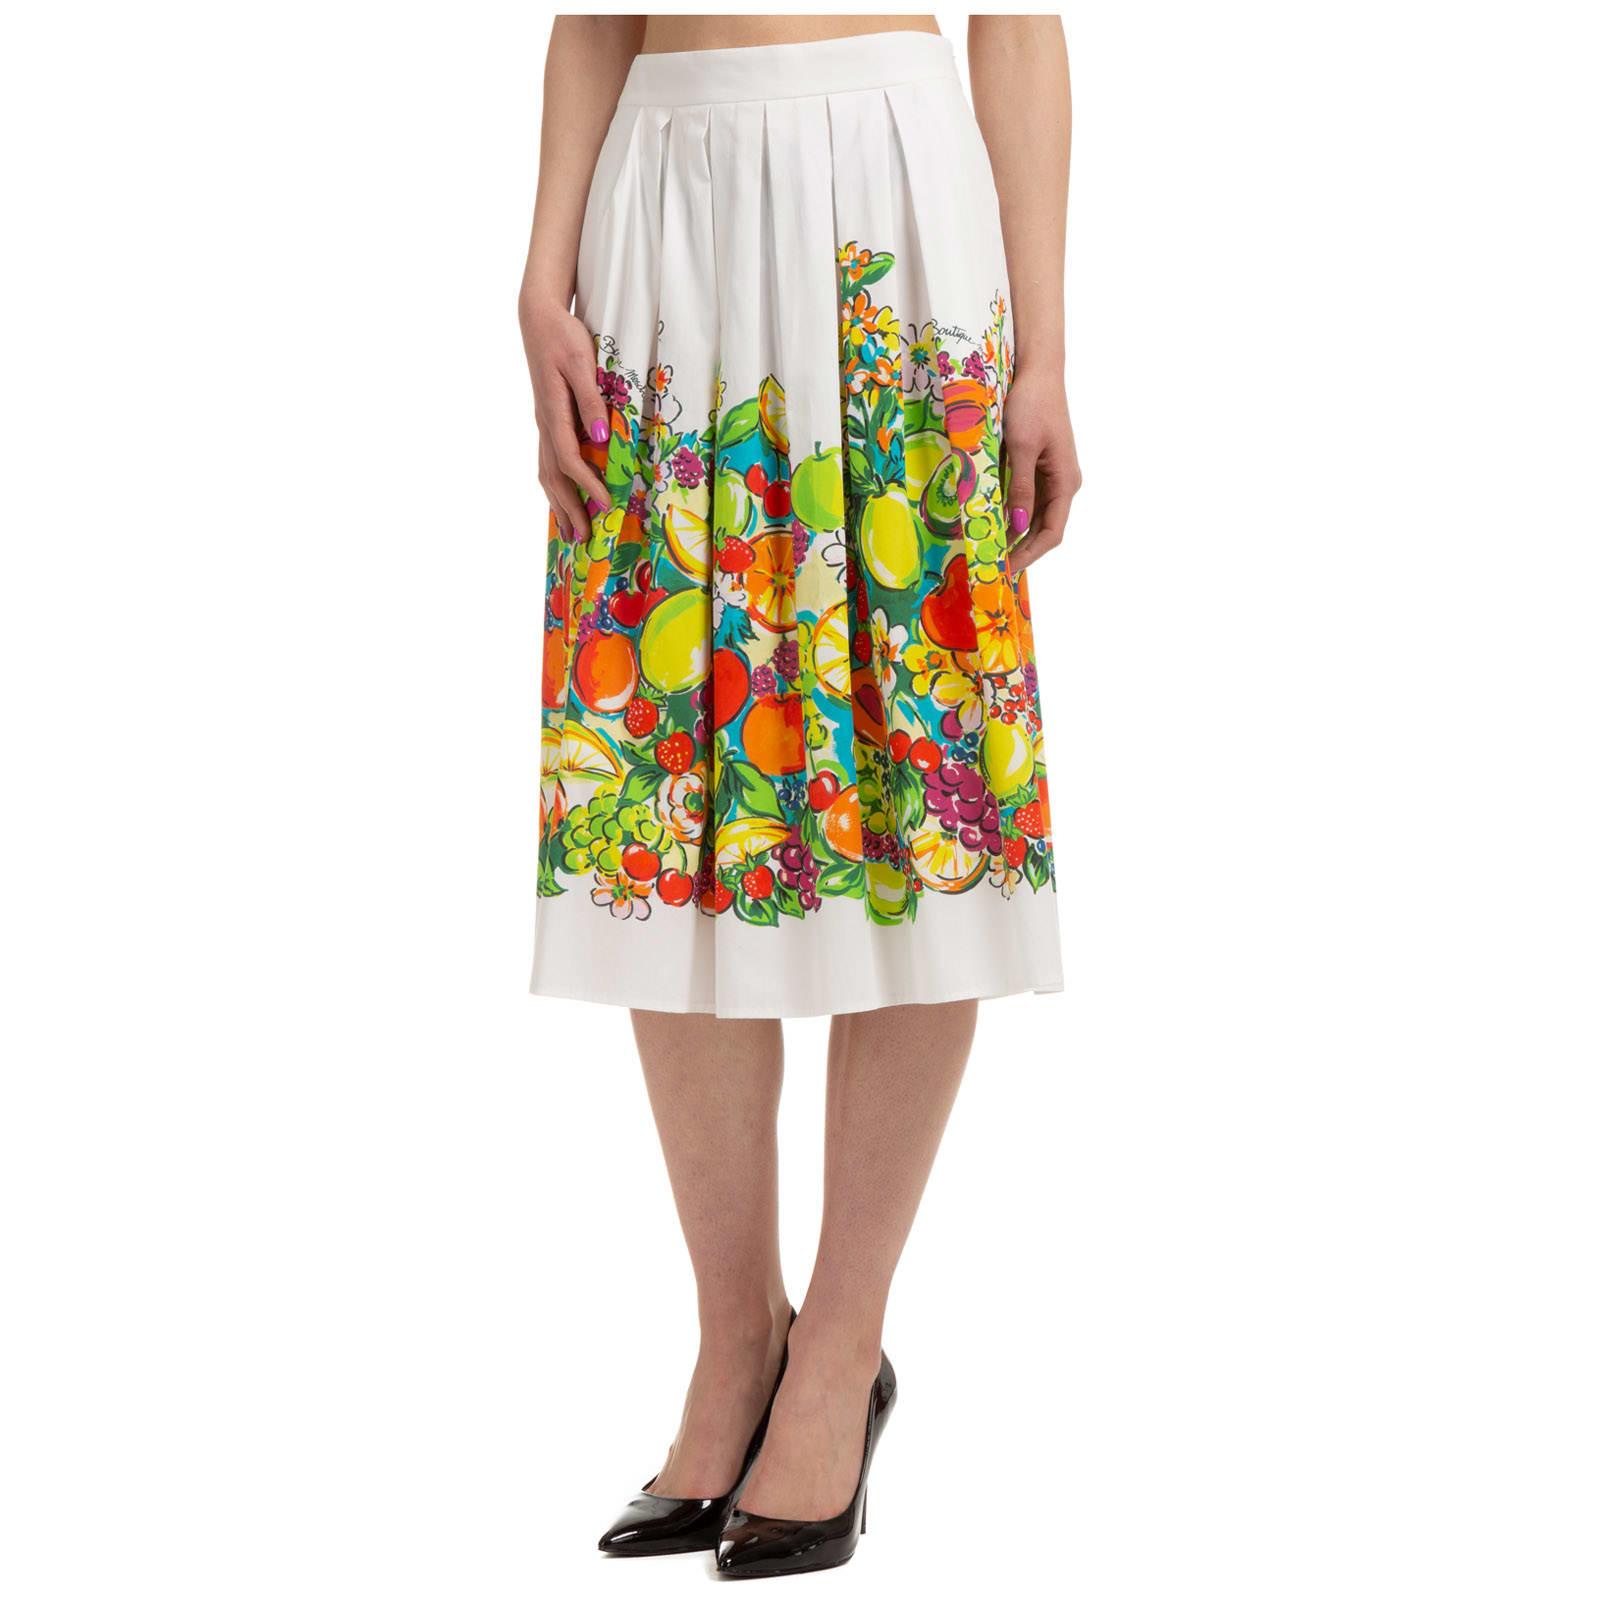 Boutique Moschino K/autograph Skirt